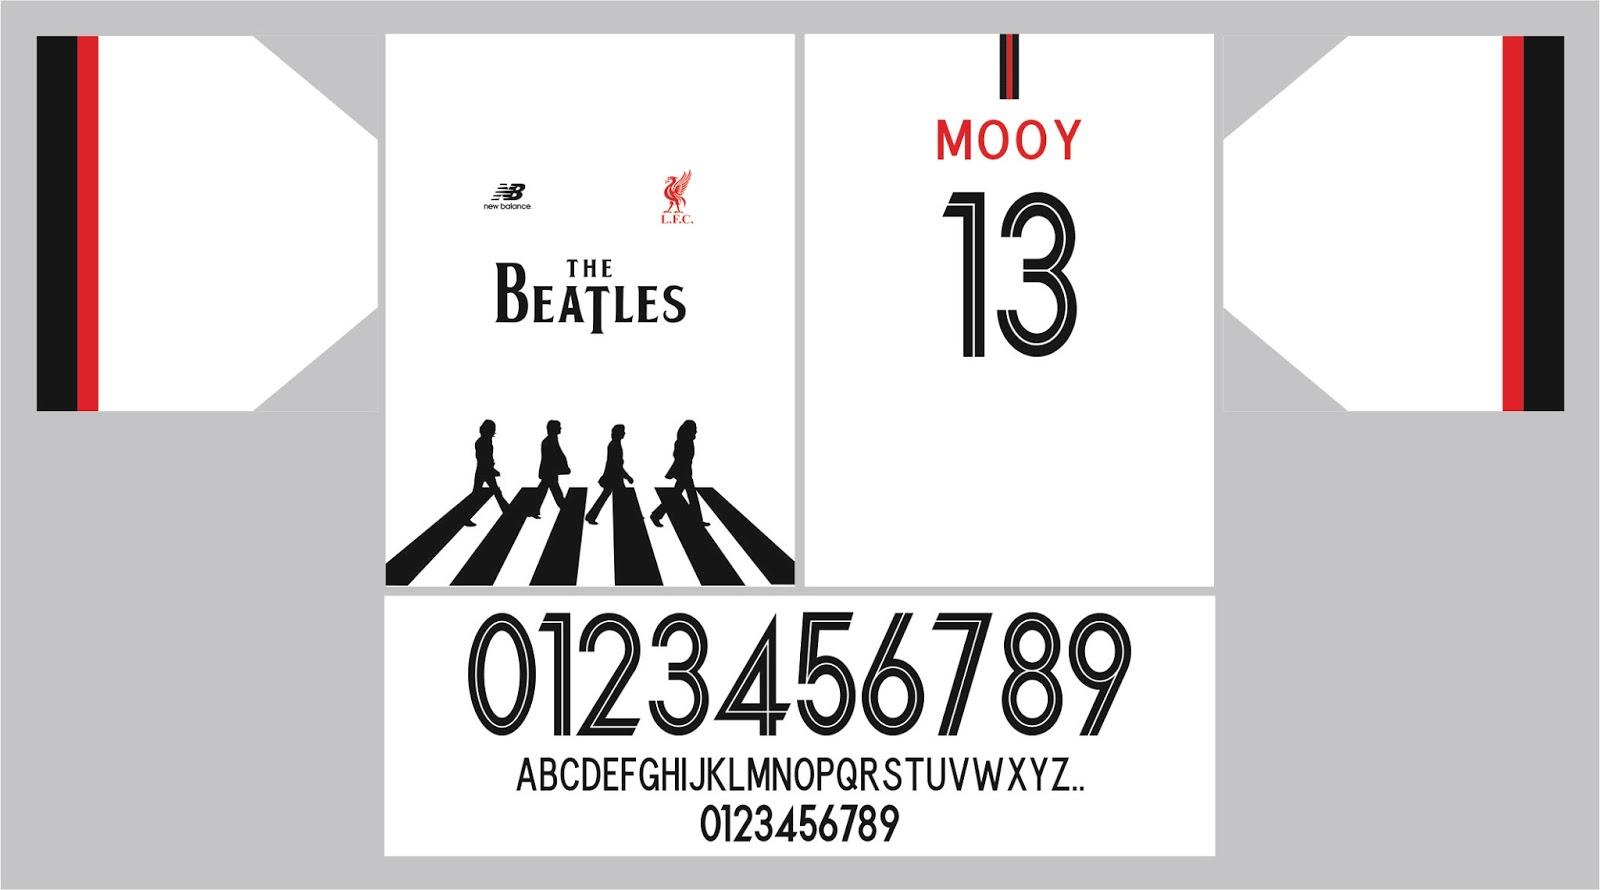 lowest price d82ba b09f5 camisetas y tipografias vectorizados: JERSEY THE BEATLES ...